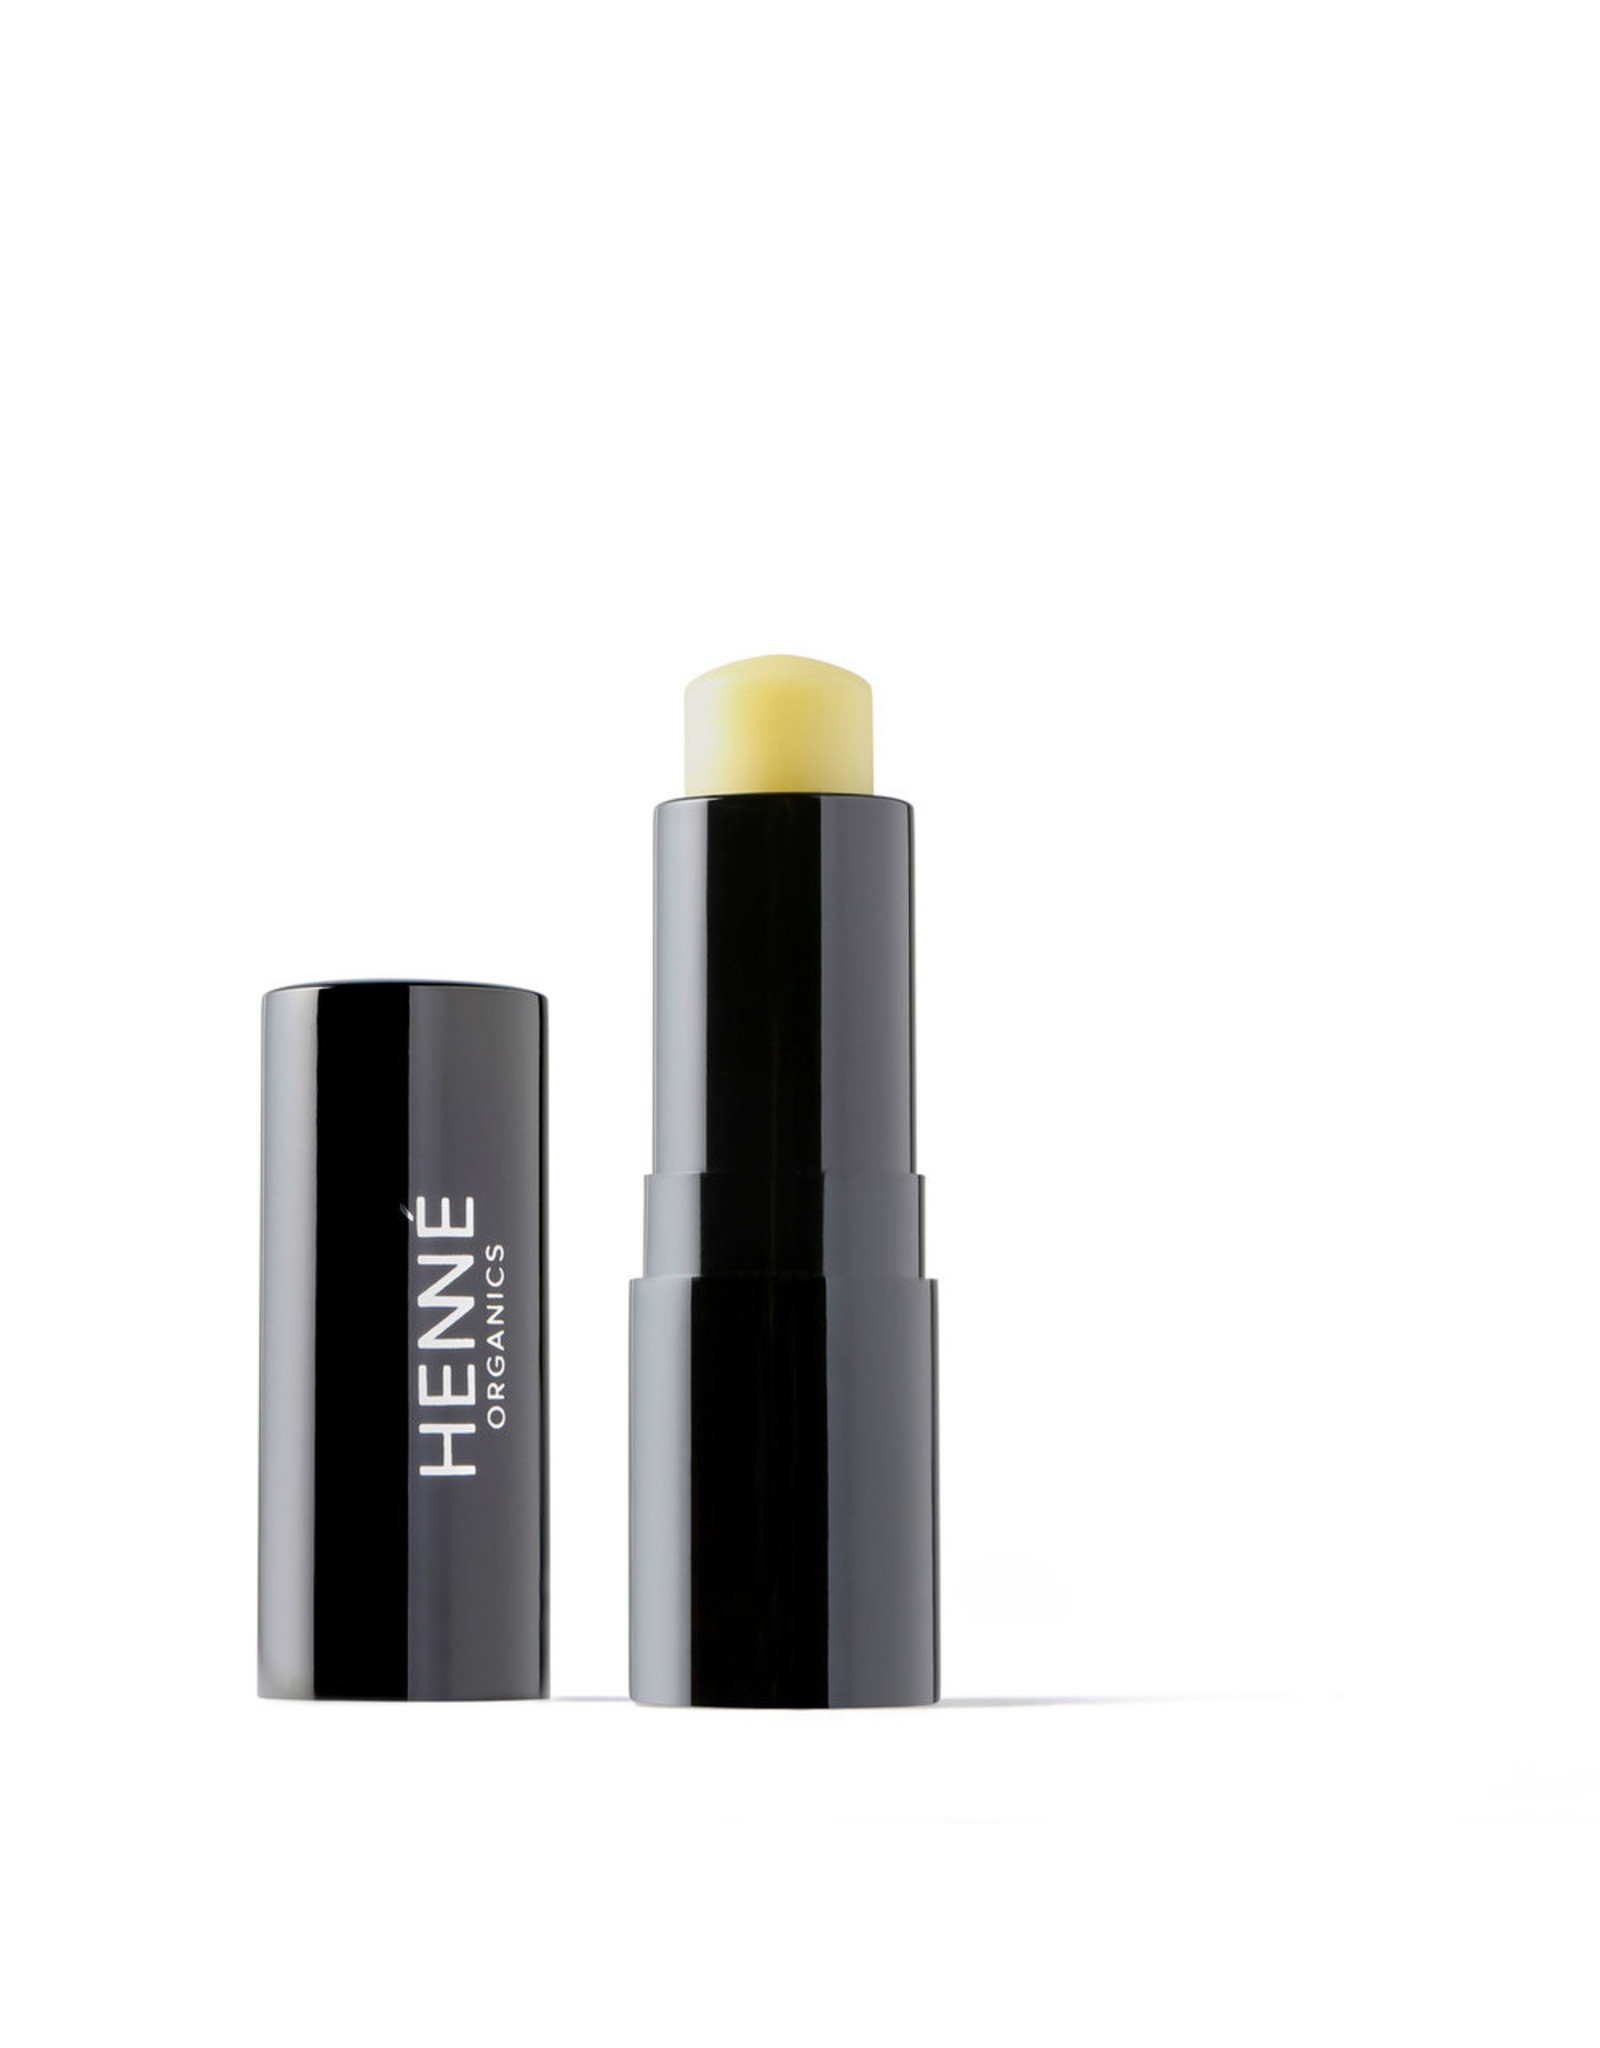 Henne Organics Henne Organics Luxury Lip Balm V2